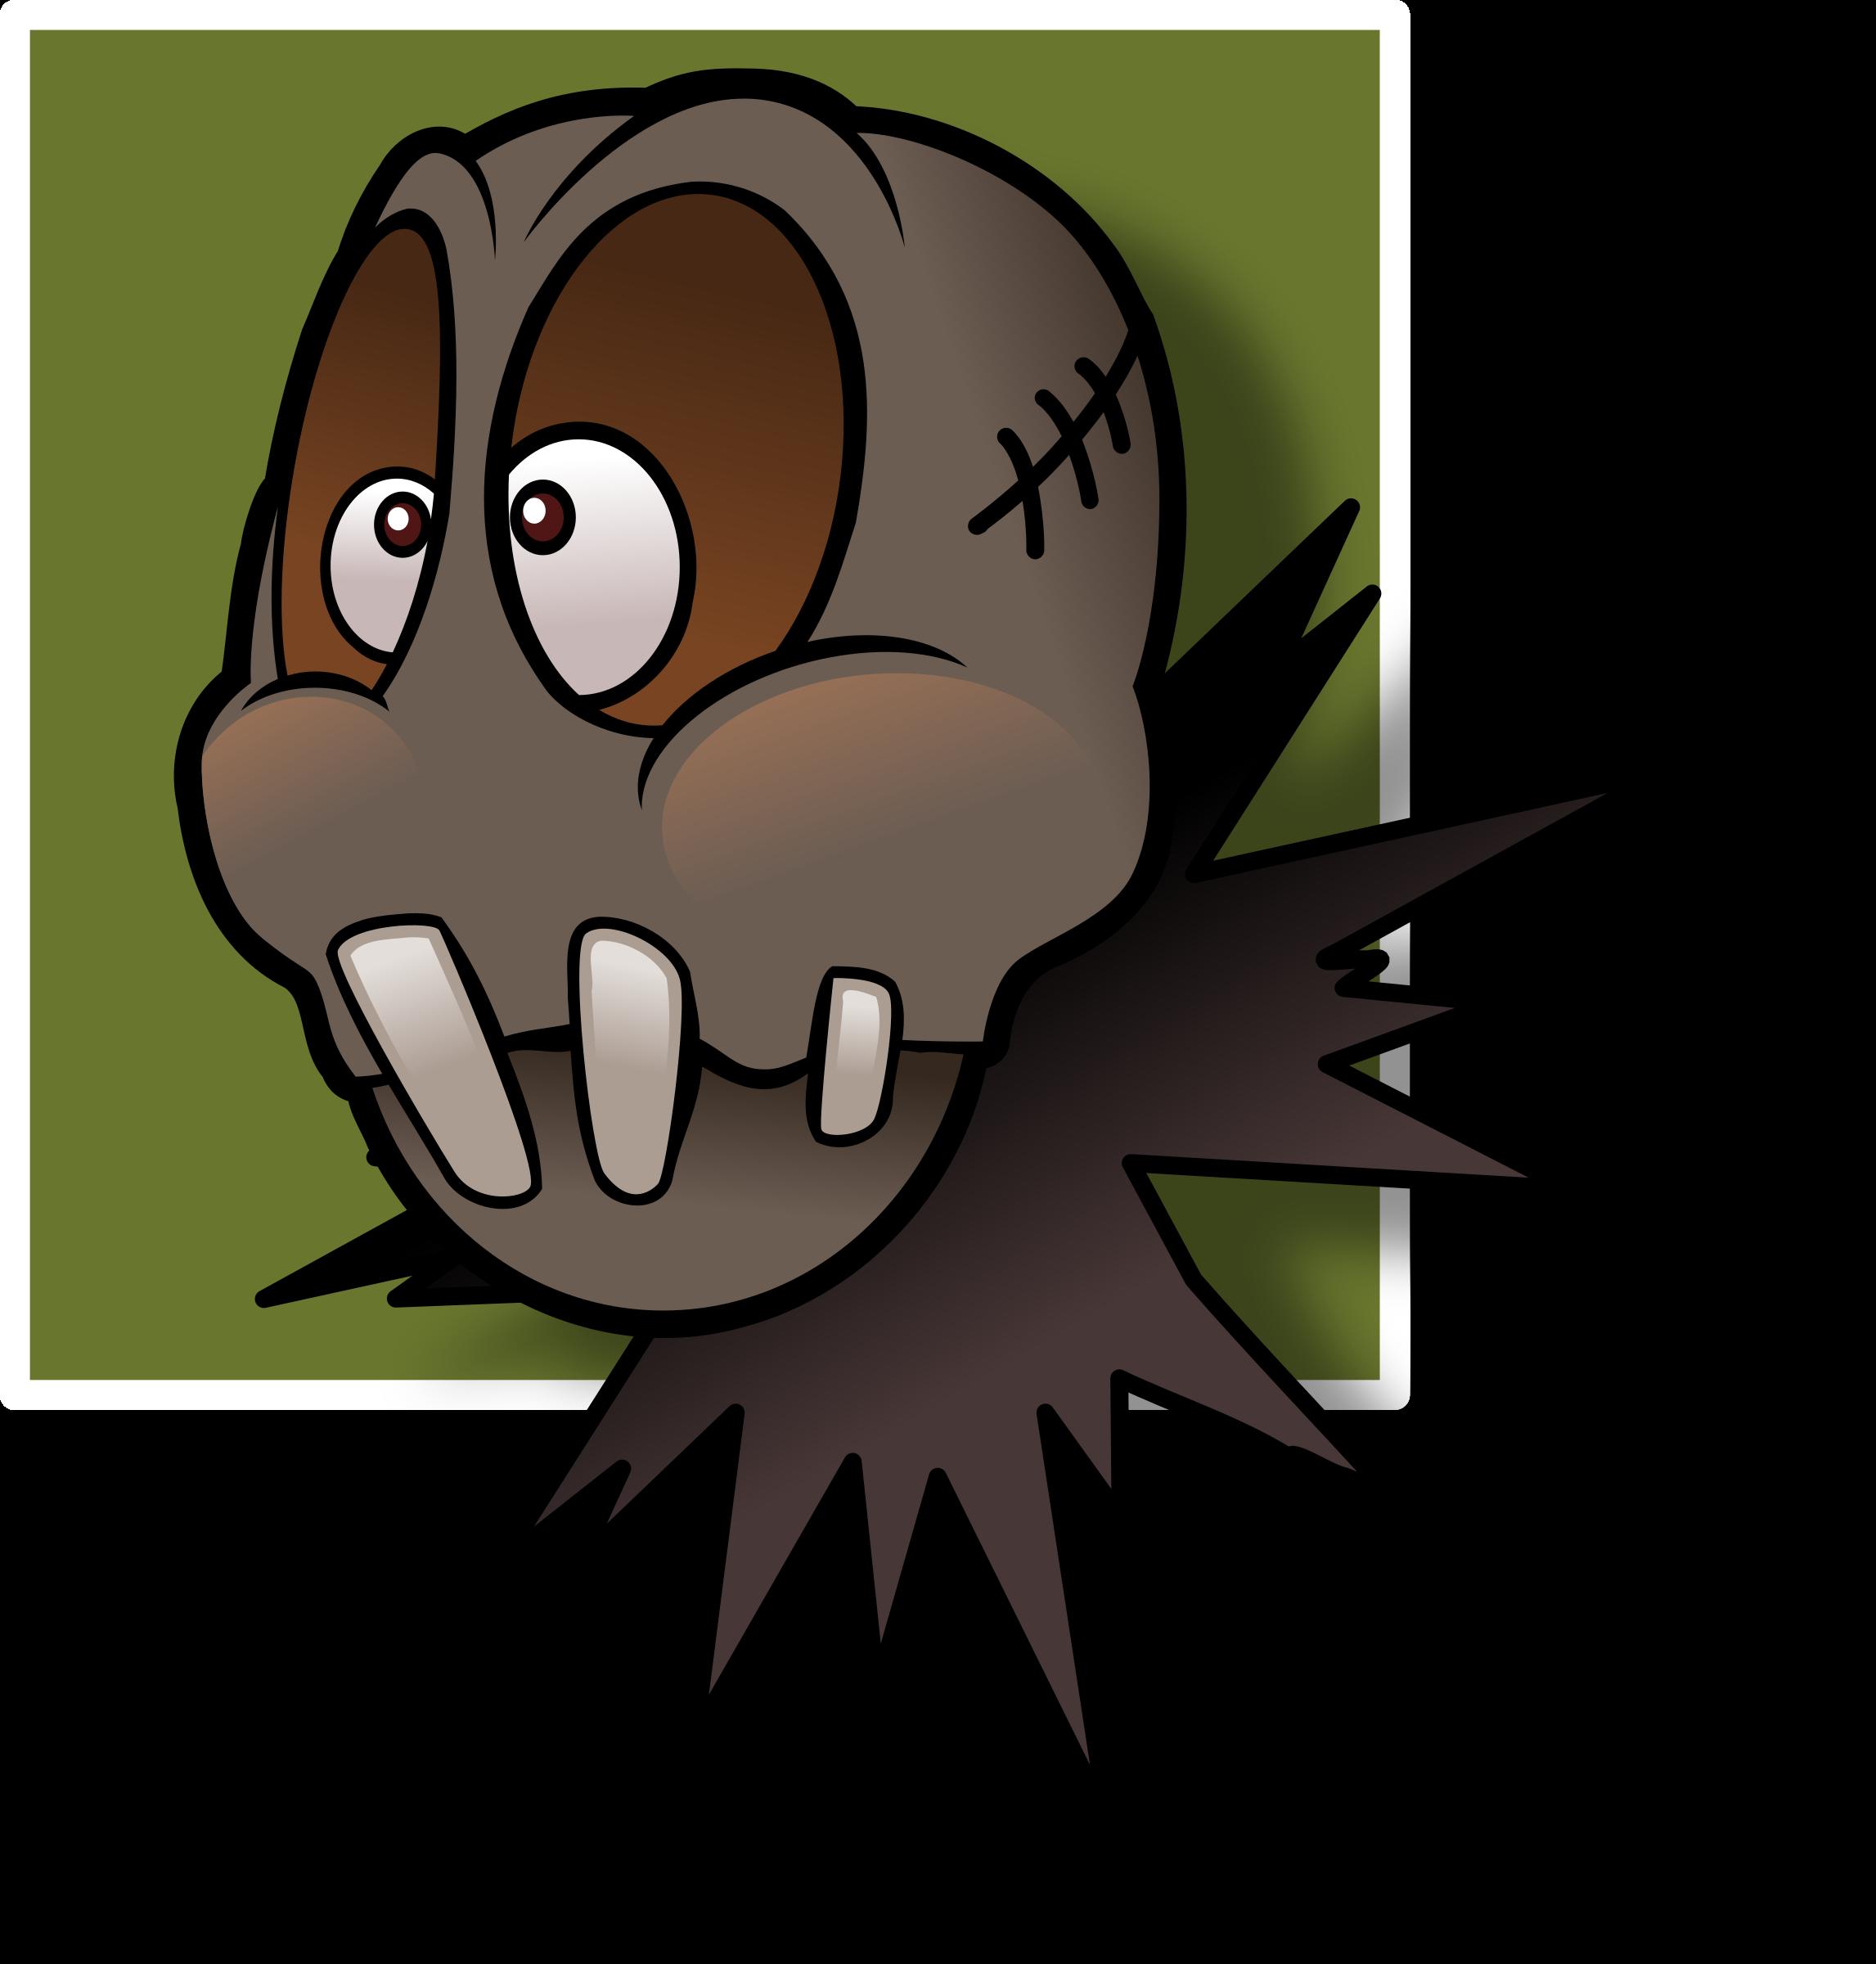 Scarecrow clipart svg. Speechless avatar big image